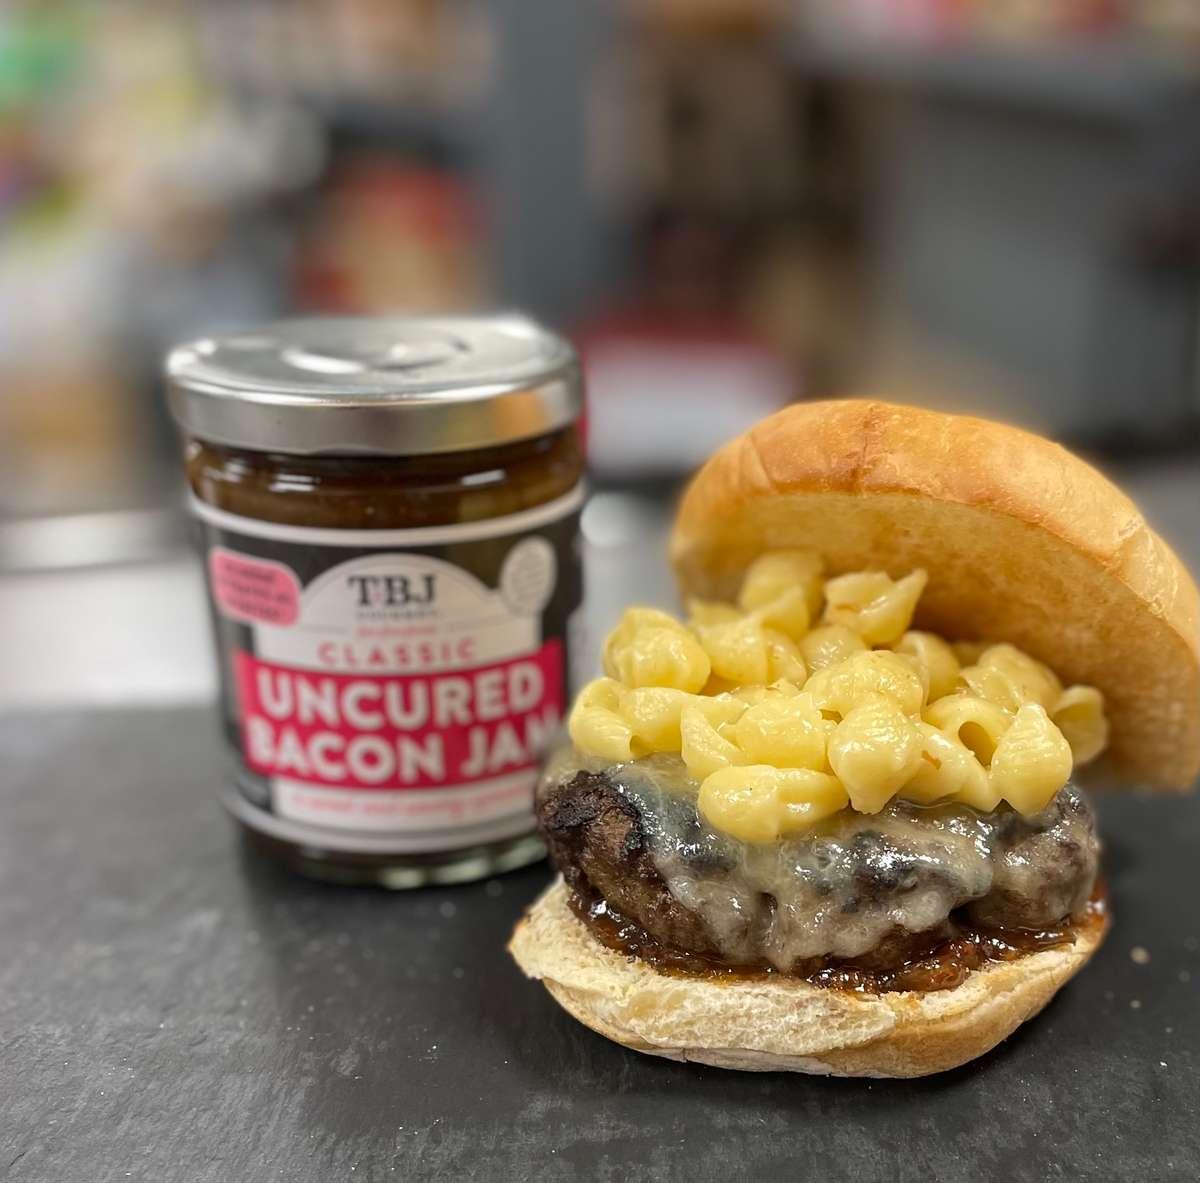 Cheeseburger with smoked gouda, hot pepper bacon jam